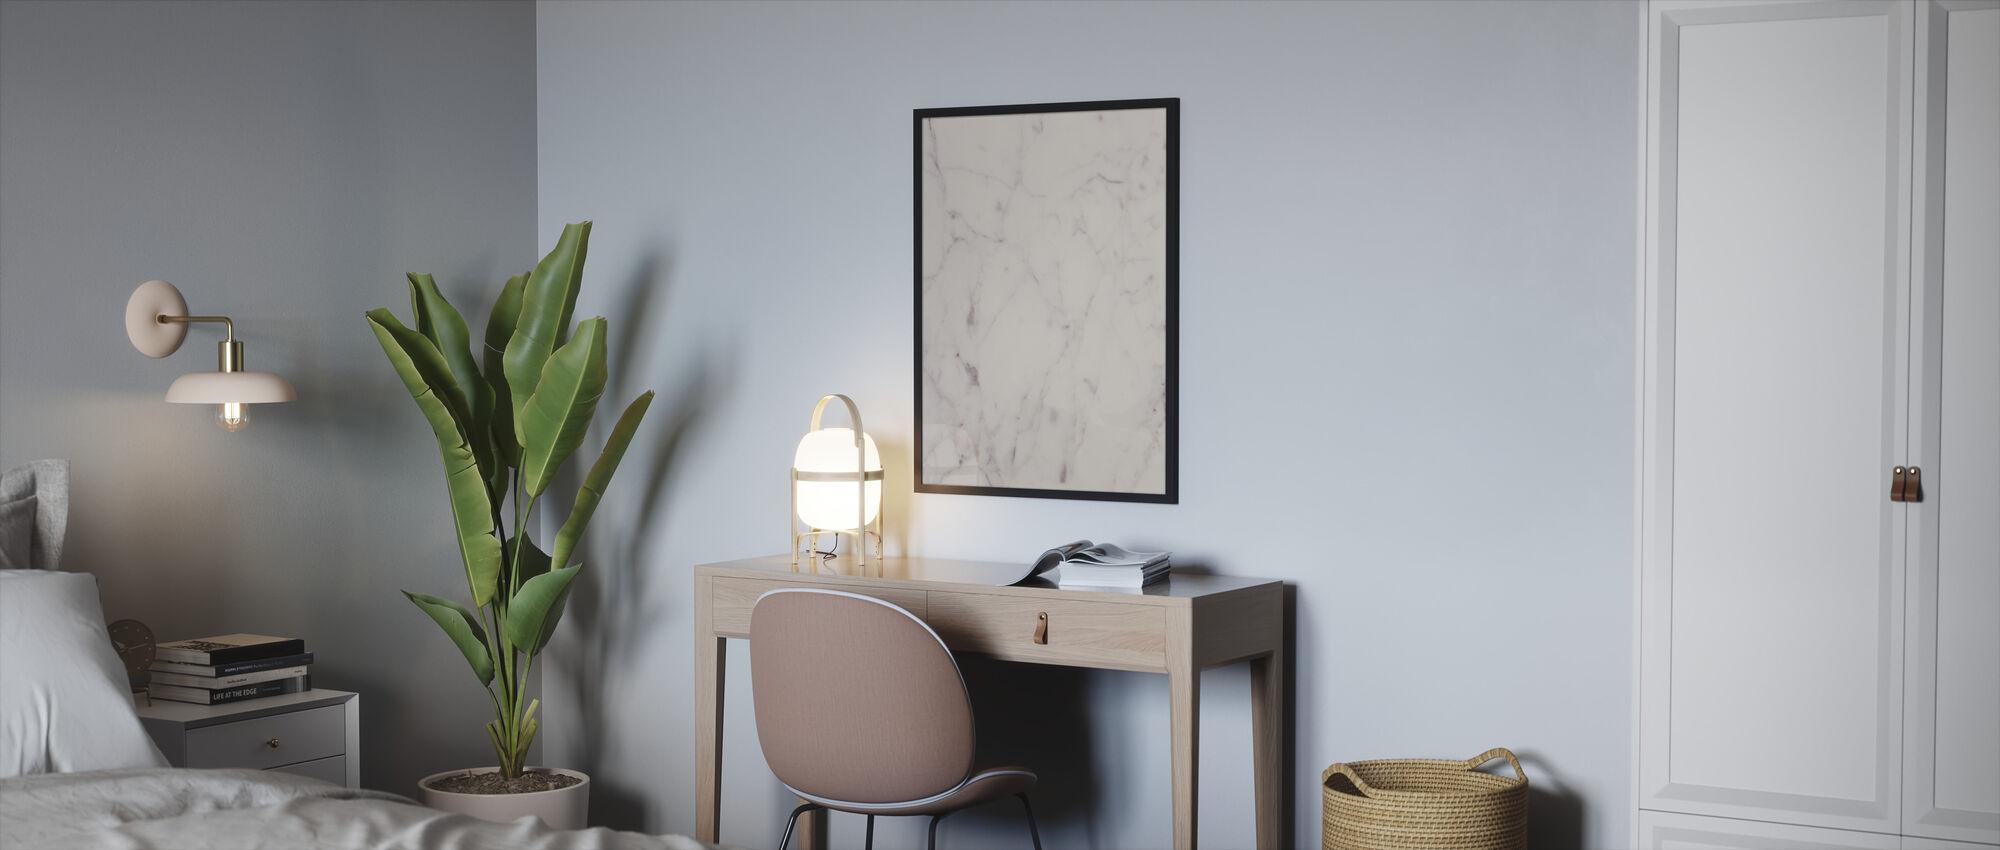 Romig wit marmer - Ingelijste print - Slaapkamer